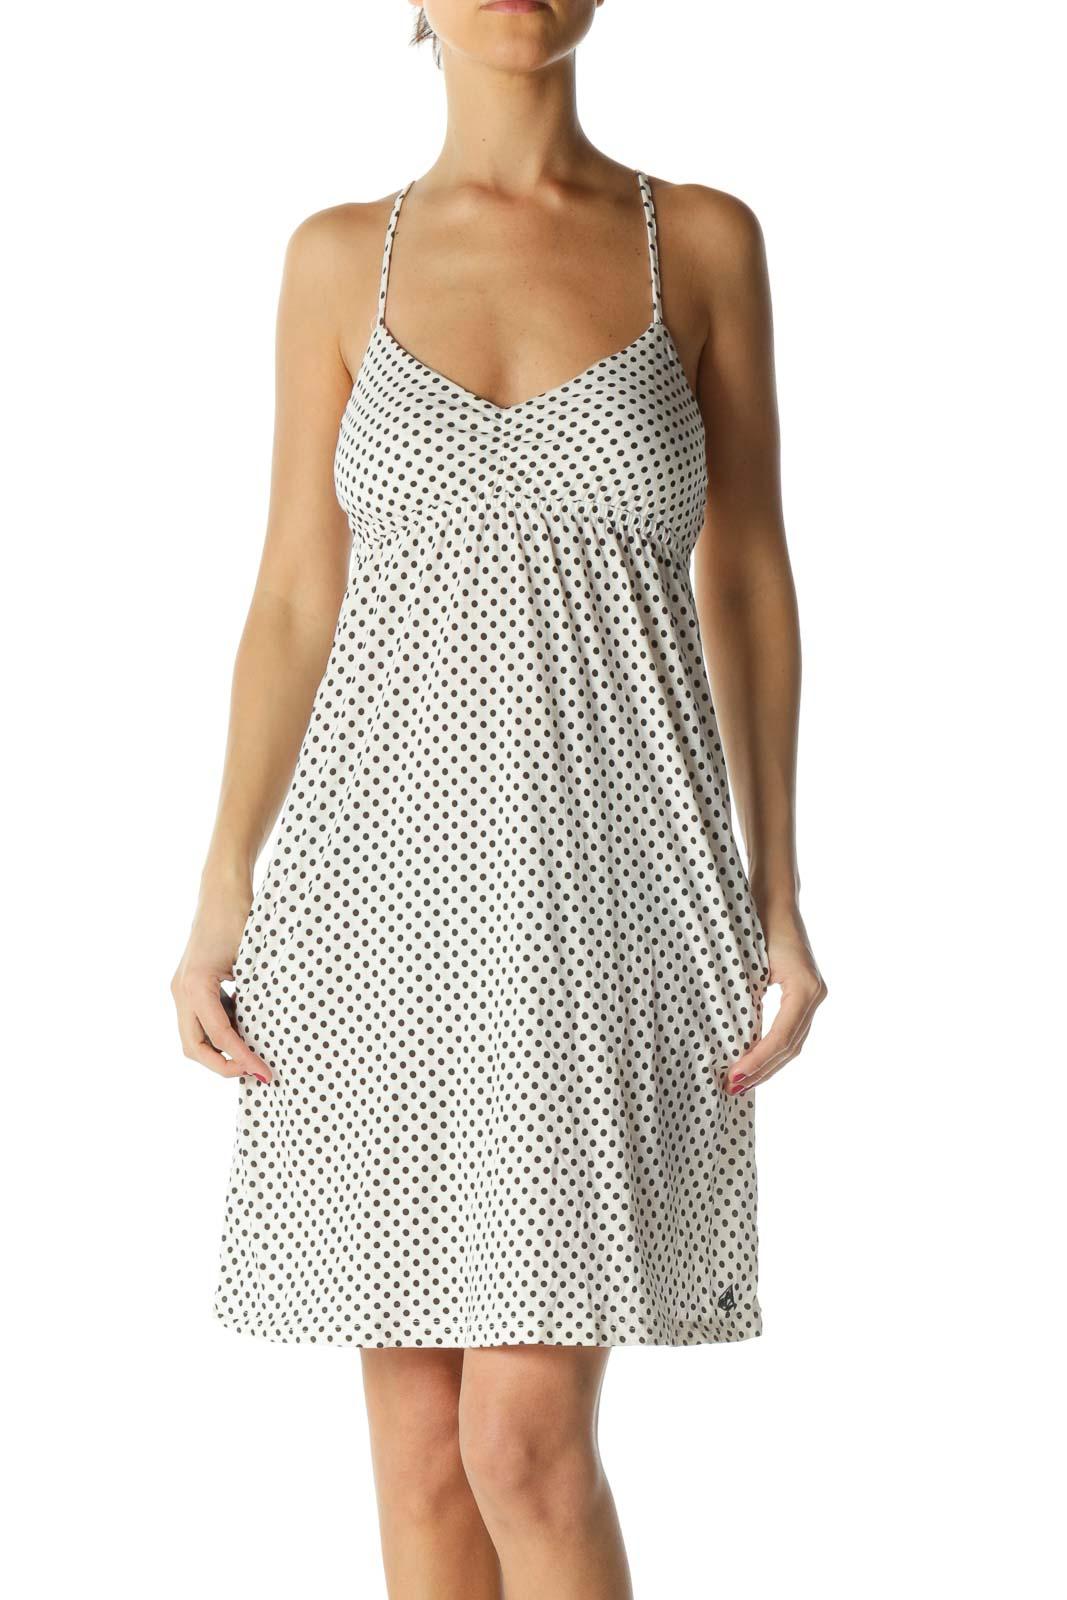 Black and White Polka-Dot Dress Front